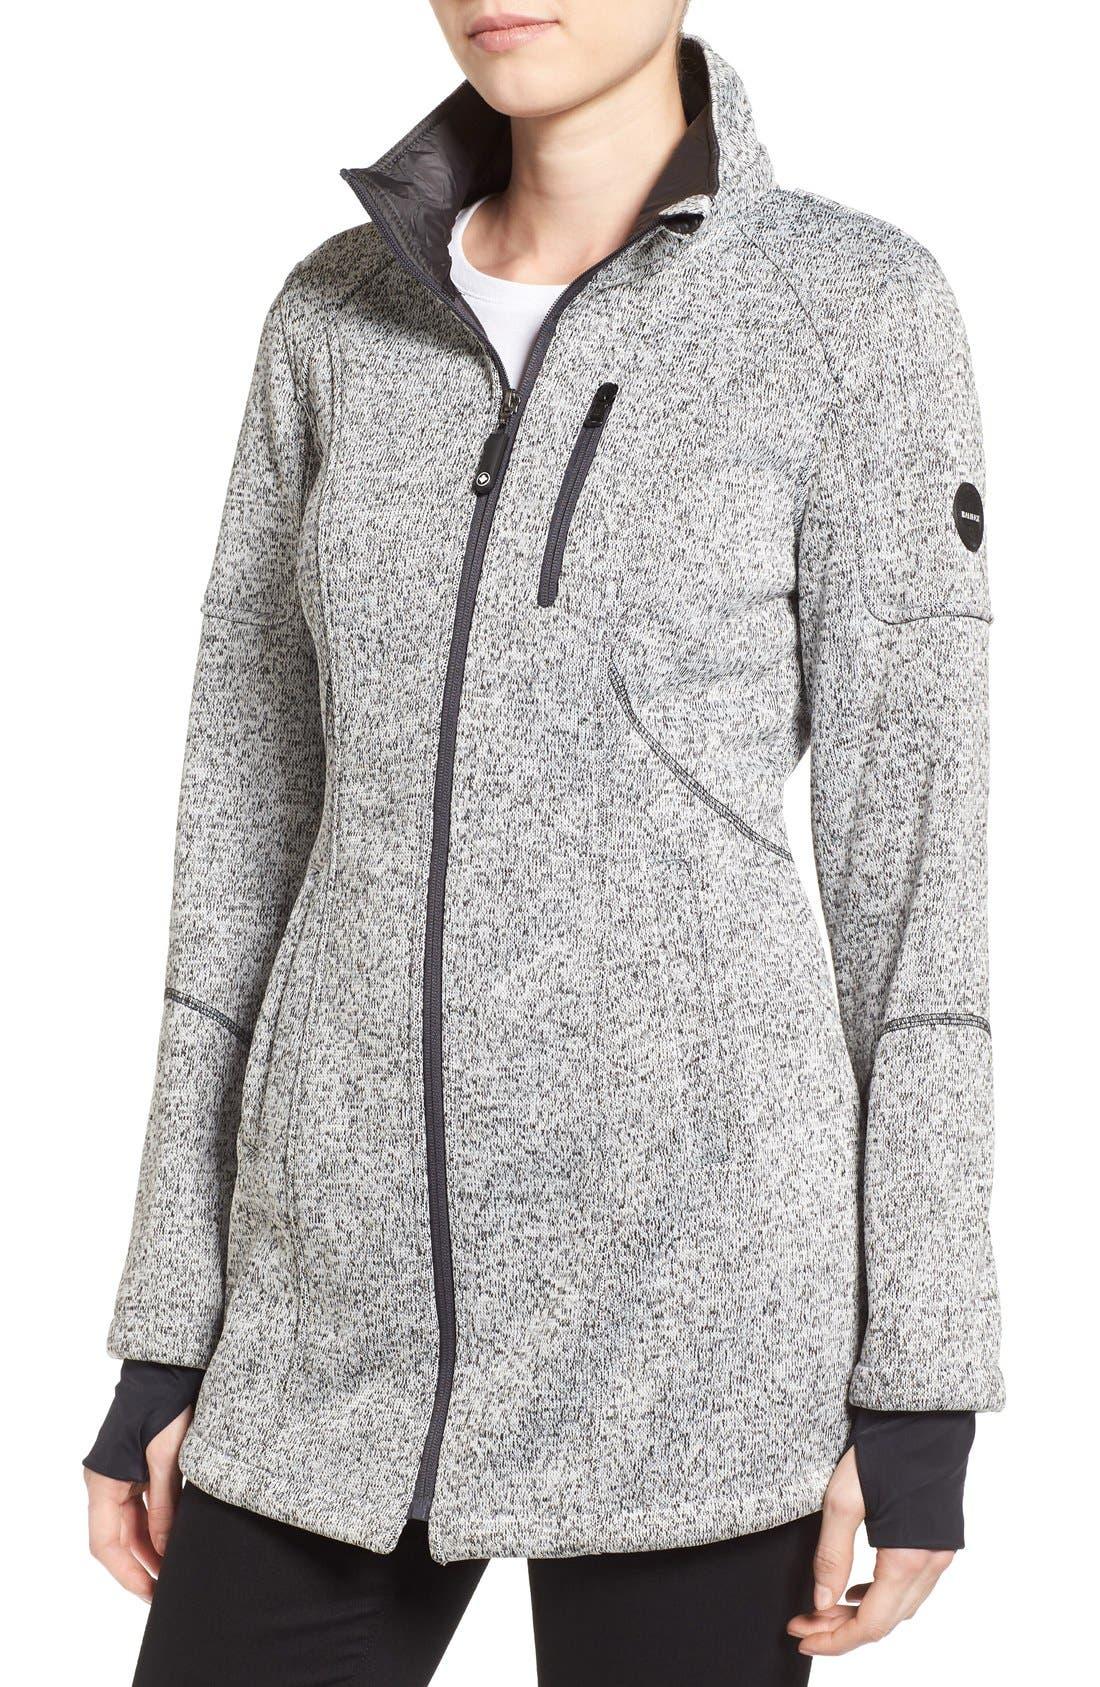 Bonded Knit Zip Front Jacket,                             Alternate thumbnail 4, color,                             070